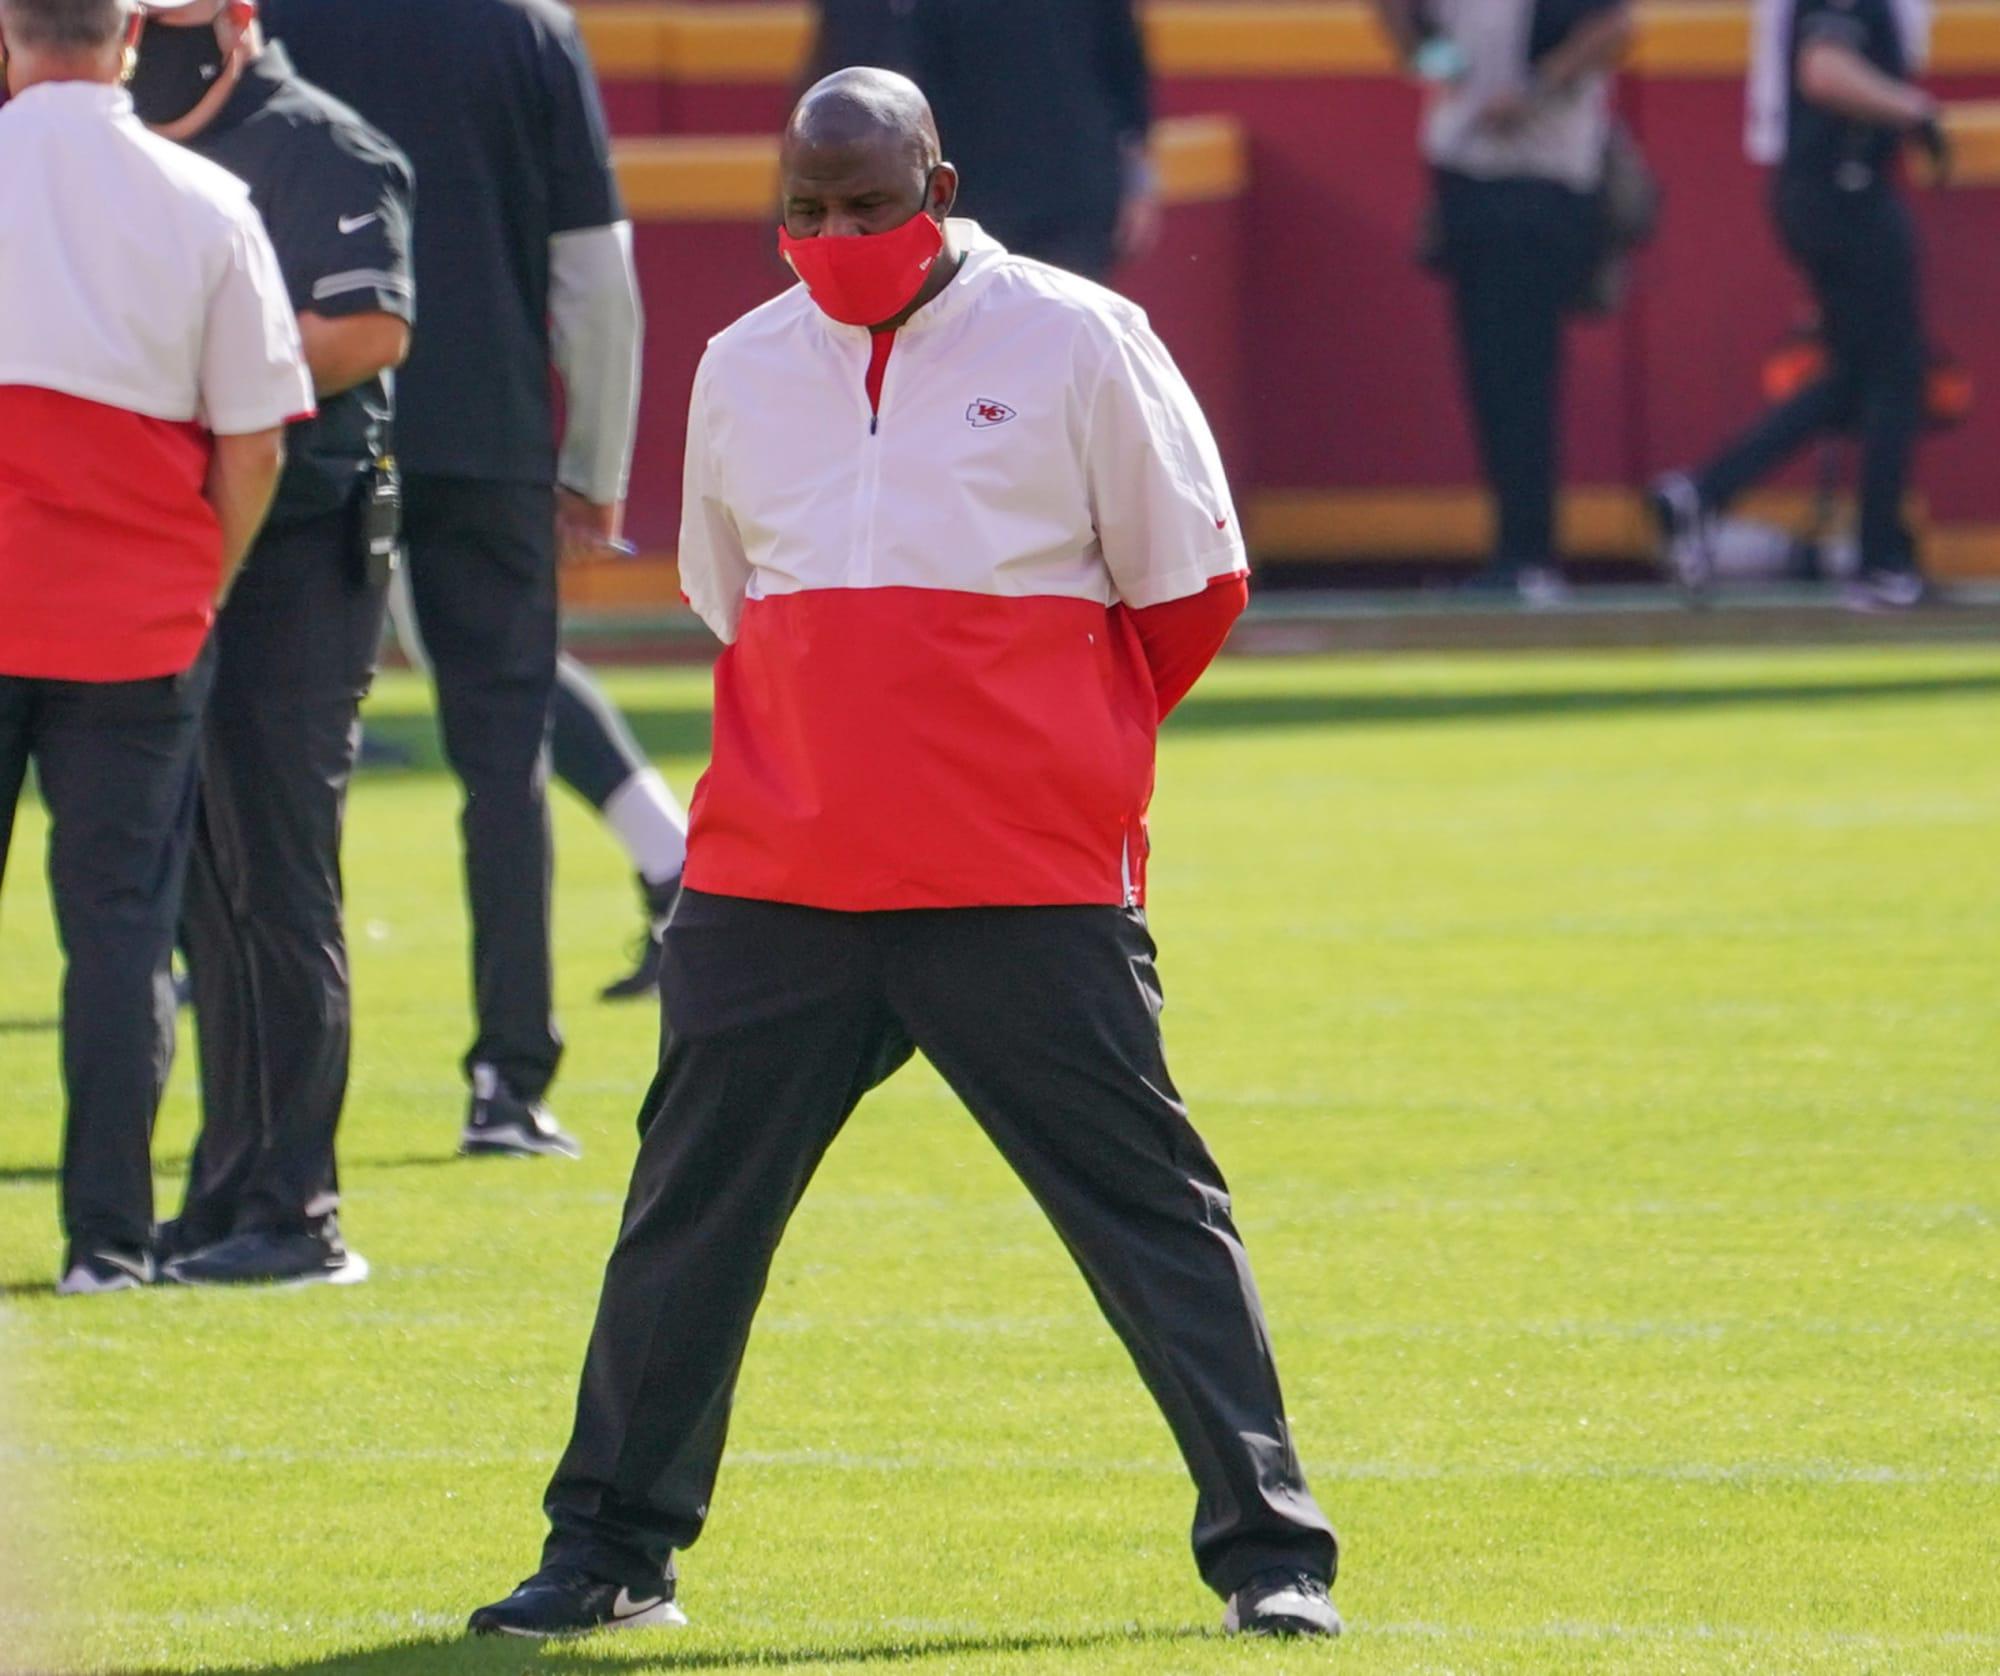 Atlanta Falcons: Eric Bieniemy will not be the next head coach